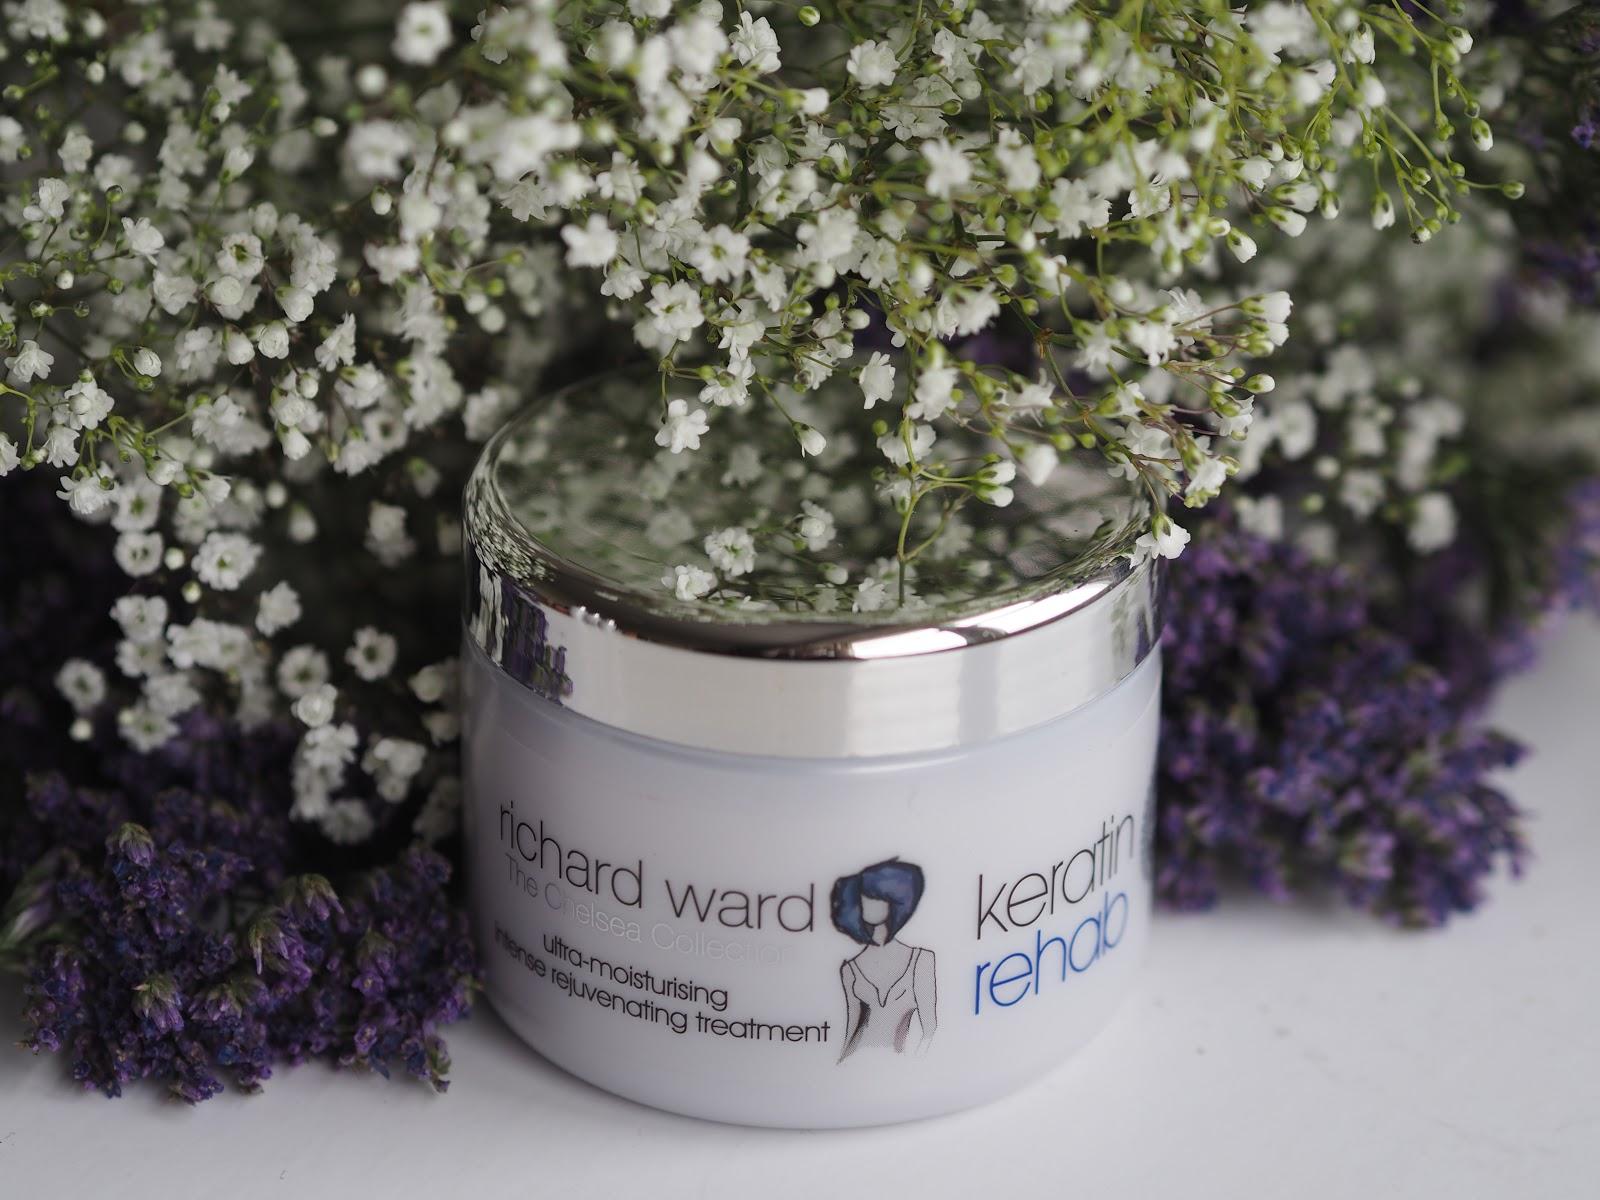 Richard Ward Keratin Rehab hair mask with flowers around it